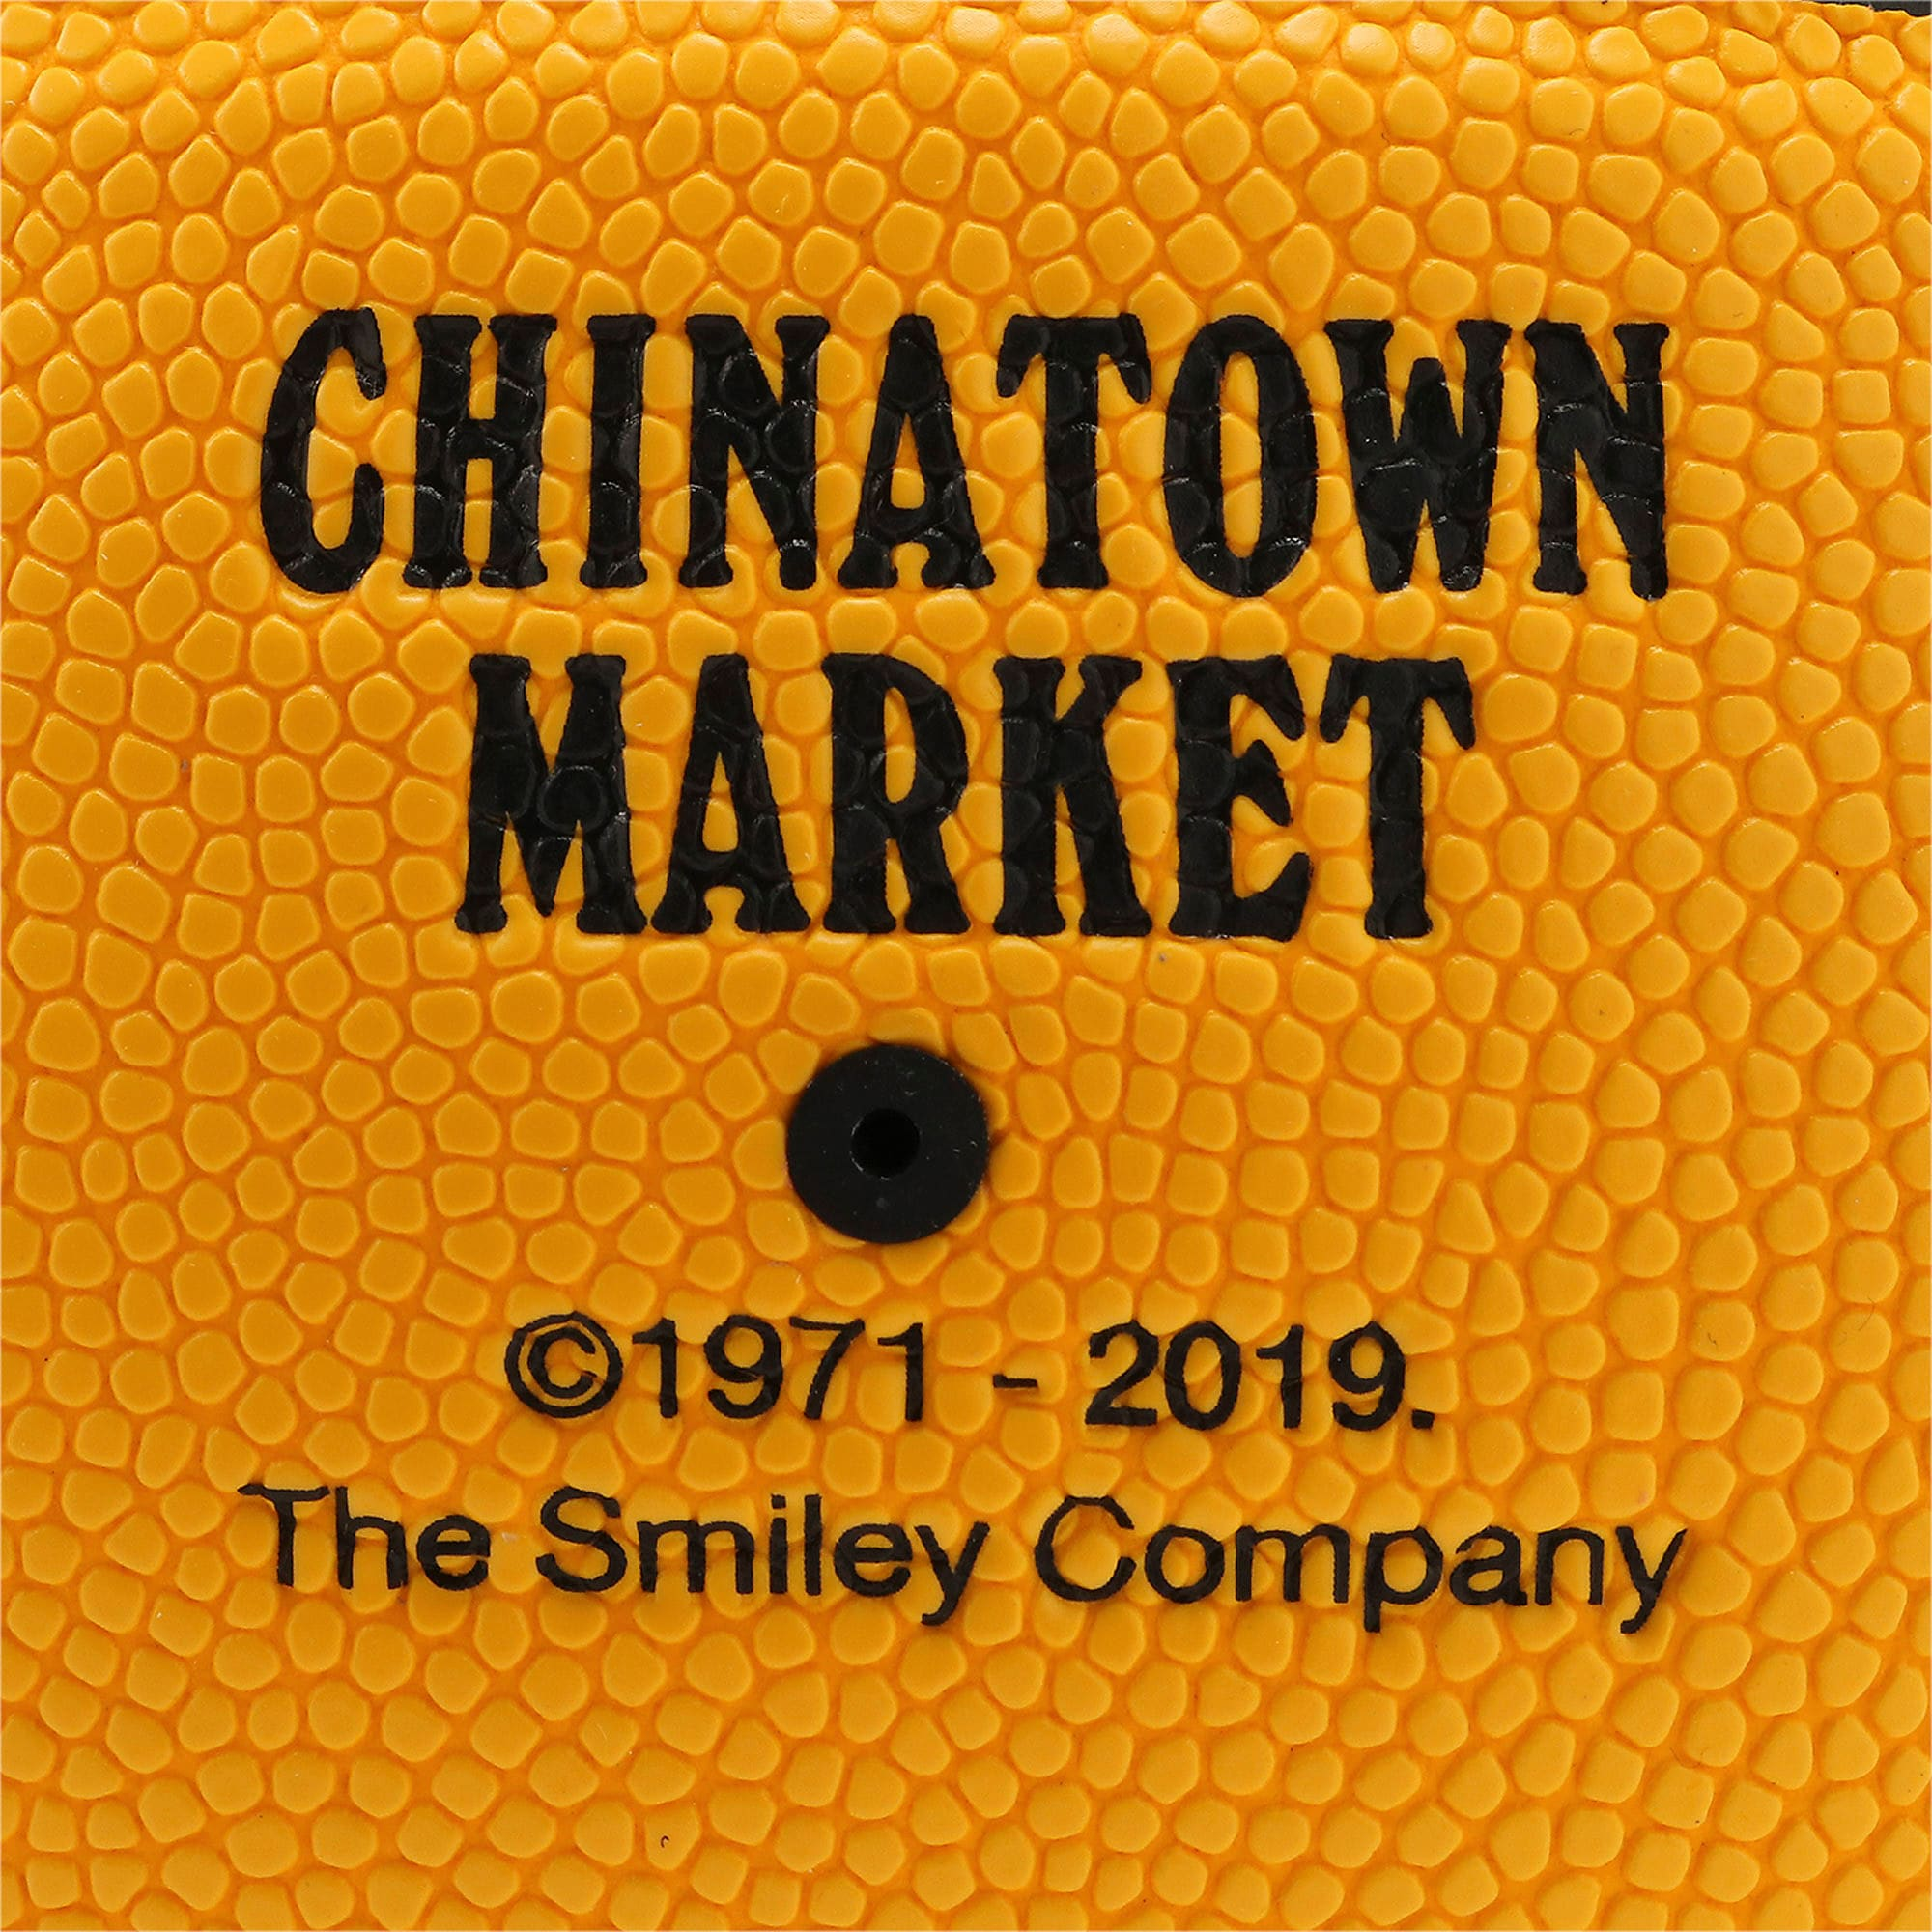 Thumbnail 5 of PUMA x CHINATOWN MARKET バスケットボール, Multi, medium-JPN